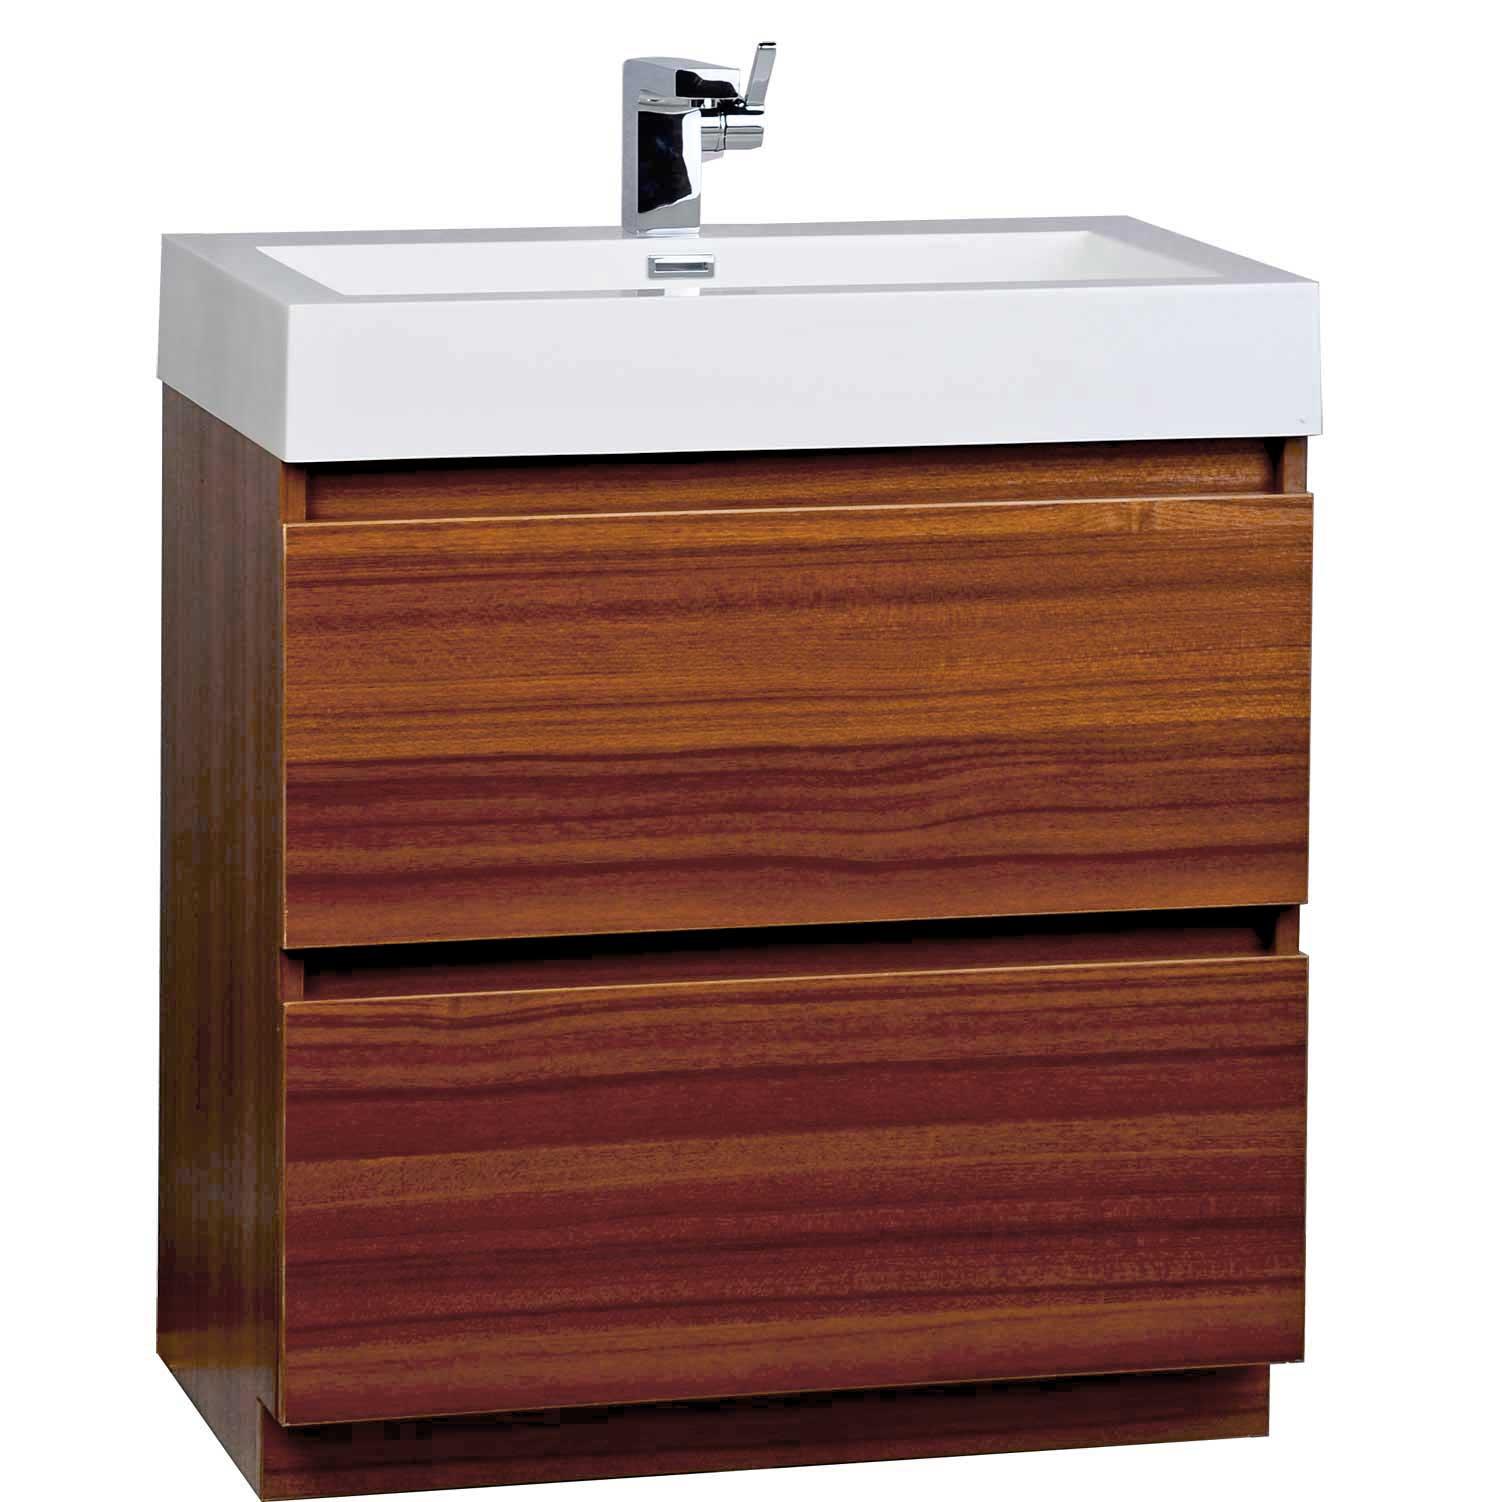 29 5 Inch Contemporary Bathroom Vanity Set in Teak Optional Mirror TN LY750 T